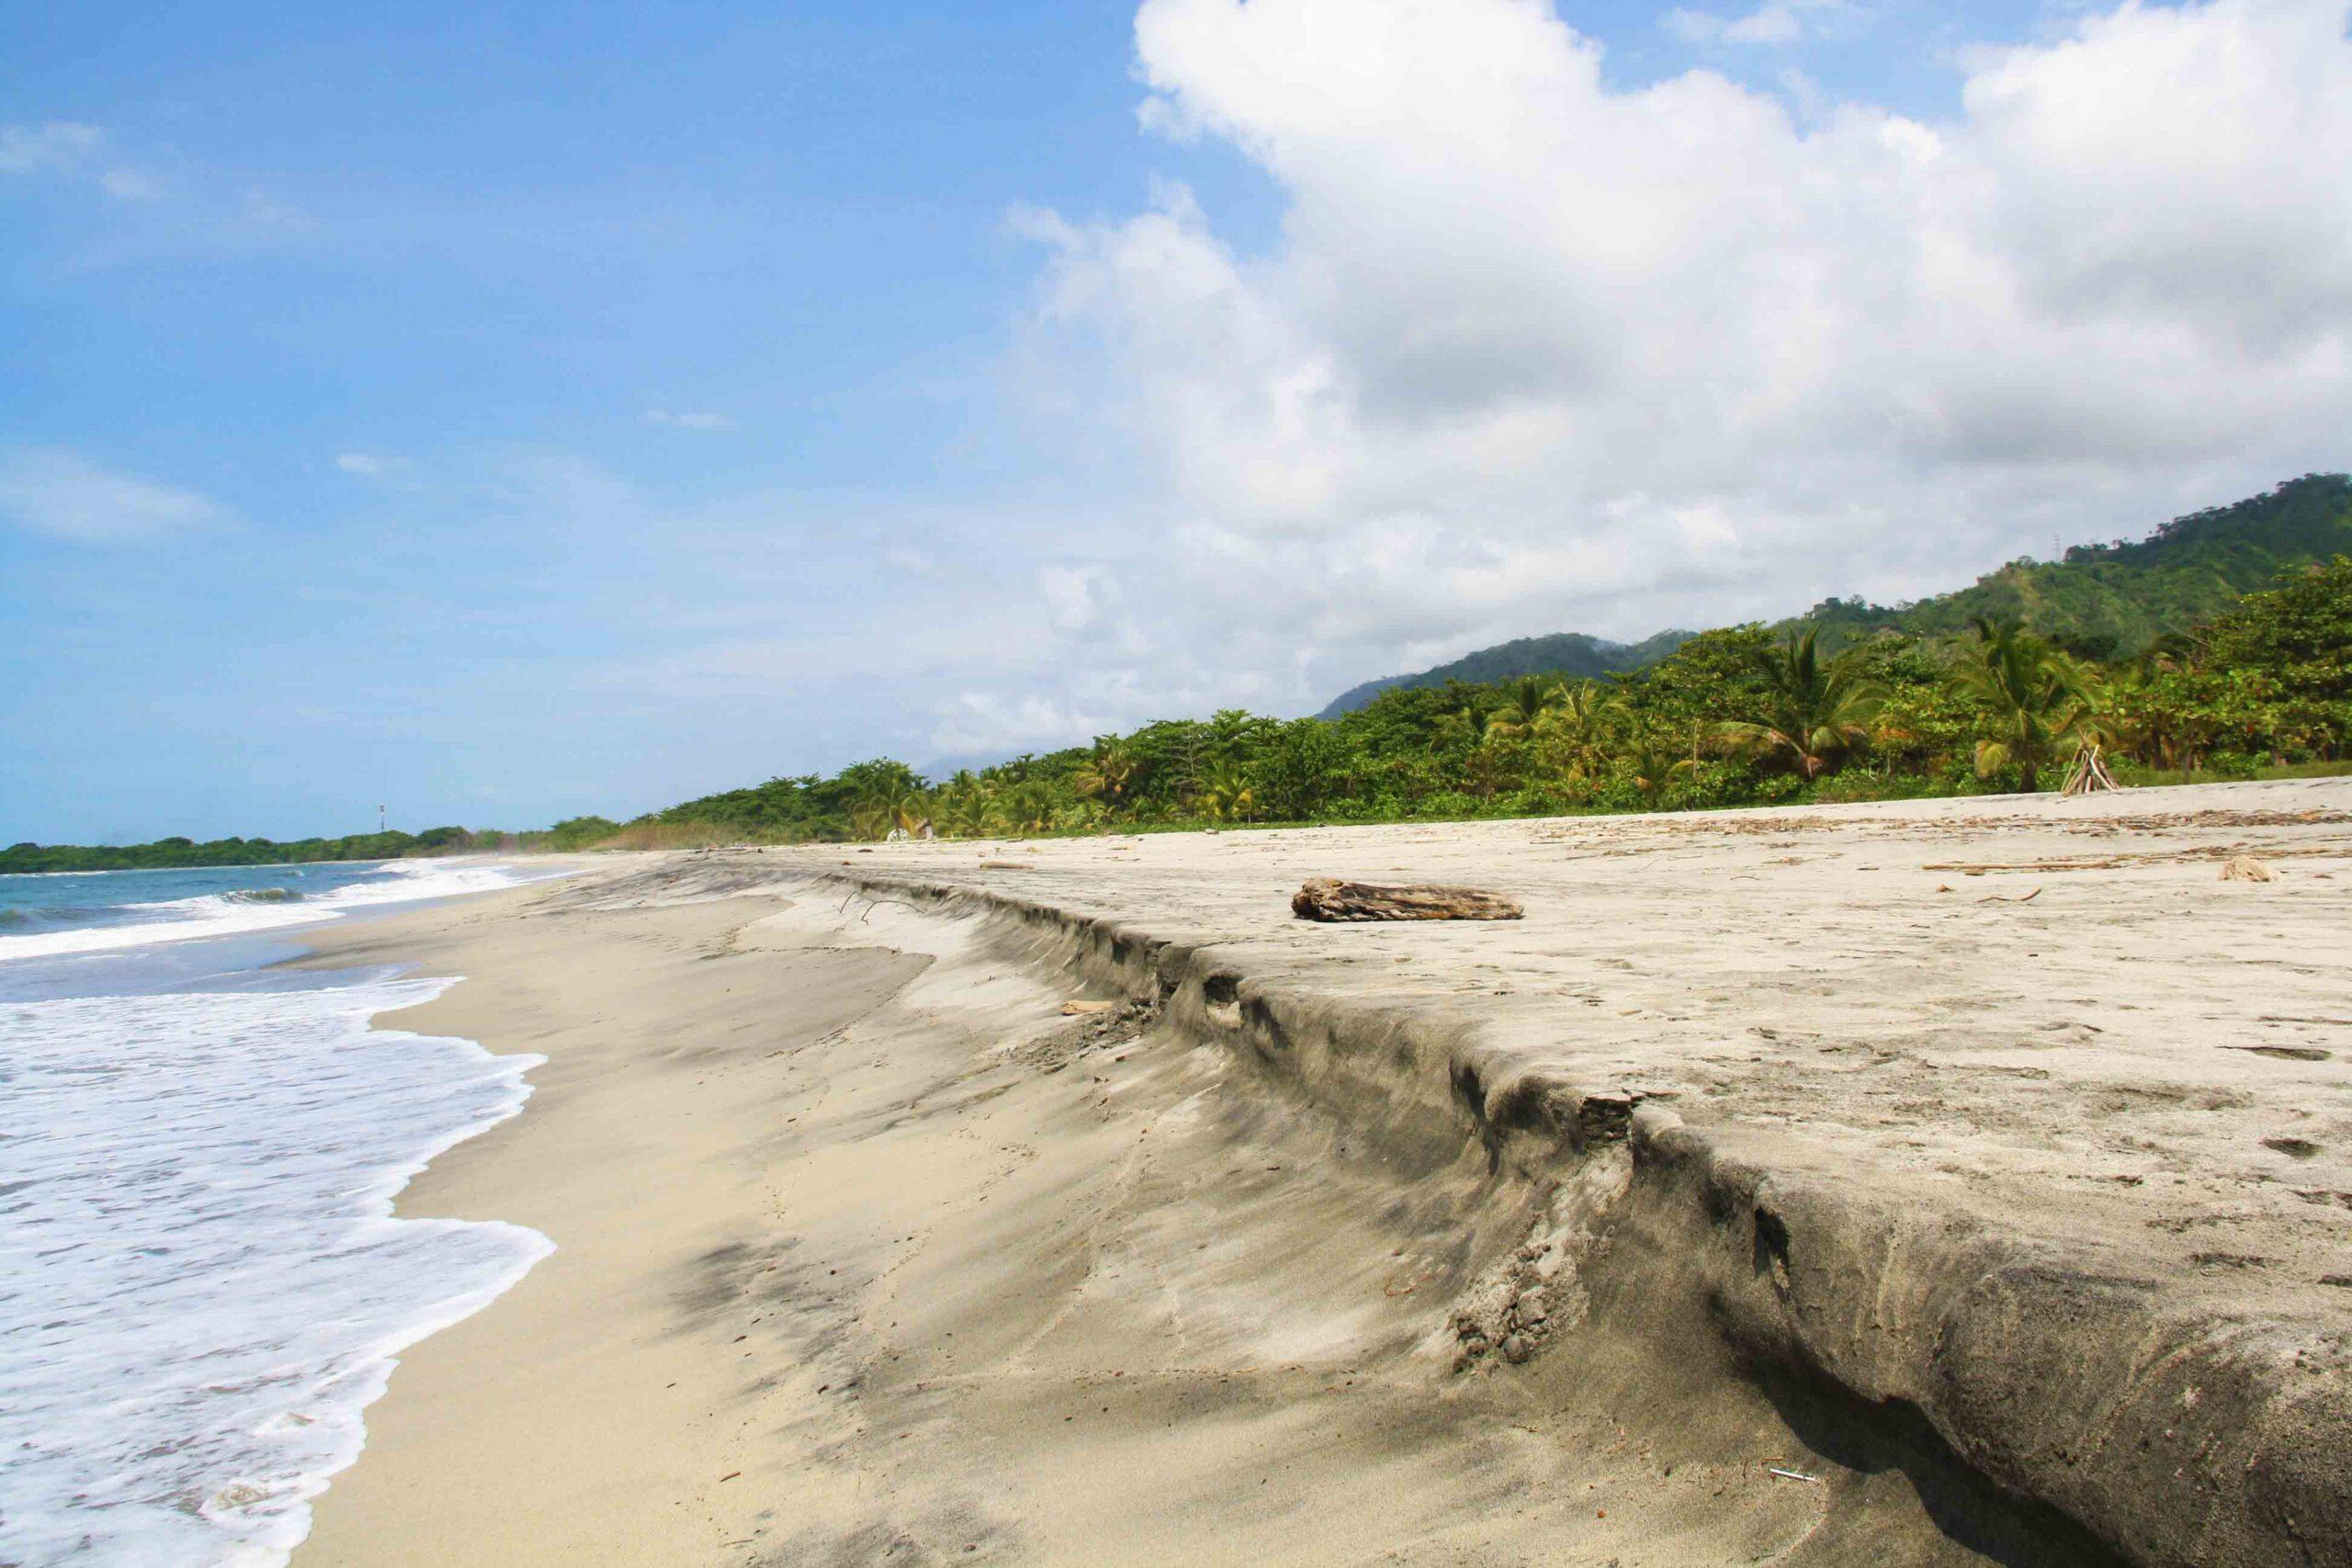 beach on the caribean coast of colombia near rancho relaxo